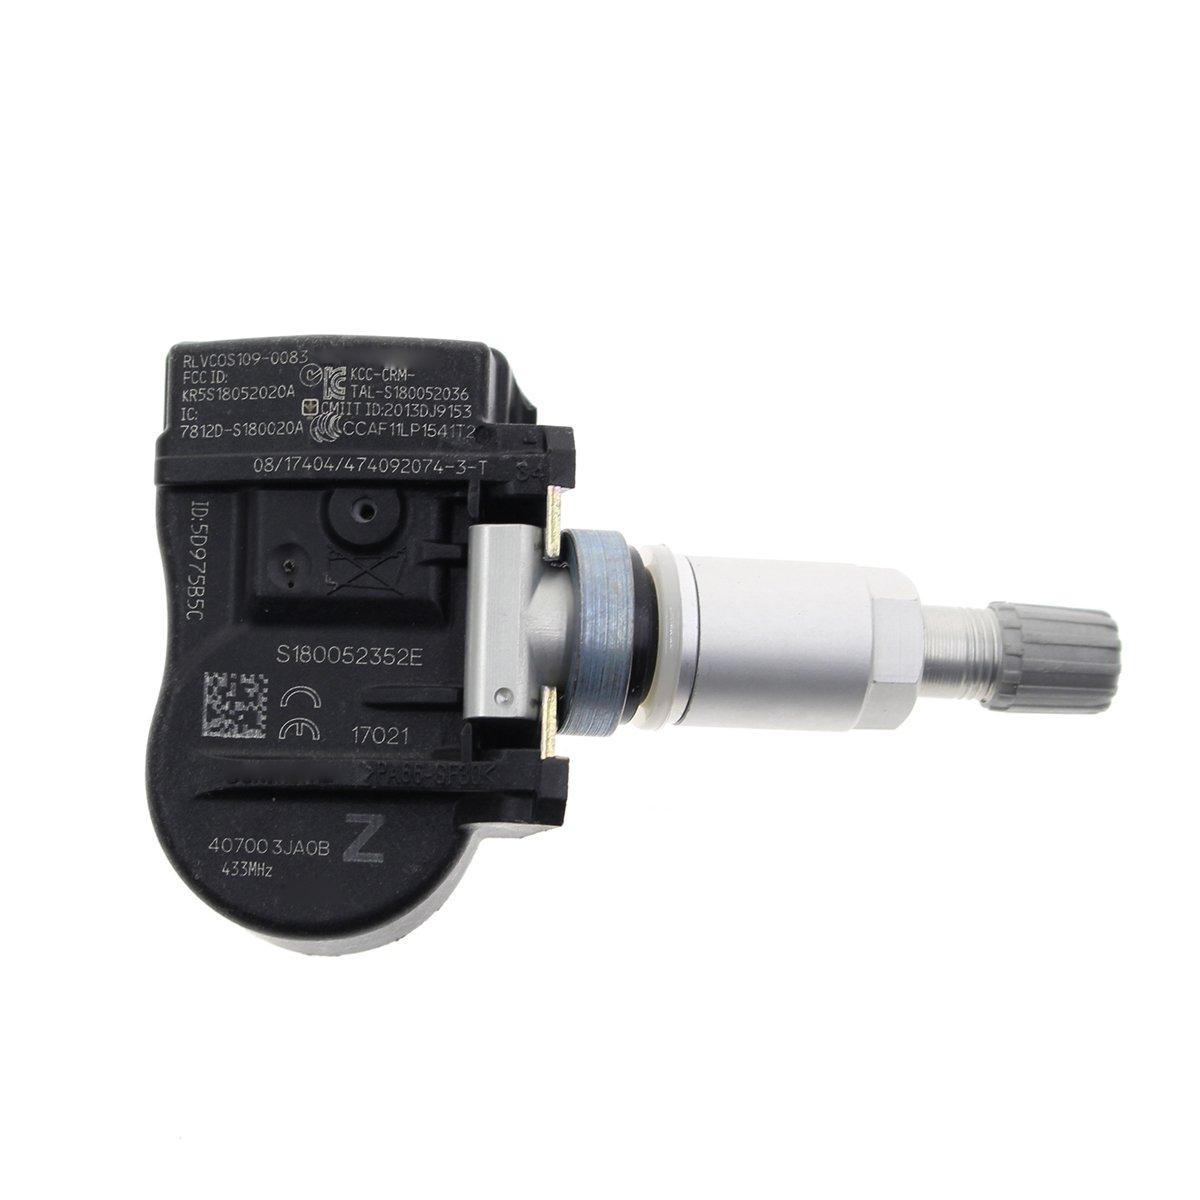 AUTOKAY Set of 4 TPMS Tire Pressure Sensor for Nissan Altima Pathfind Murano Maxima